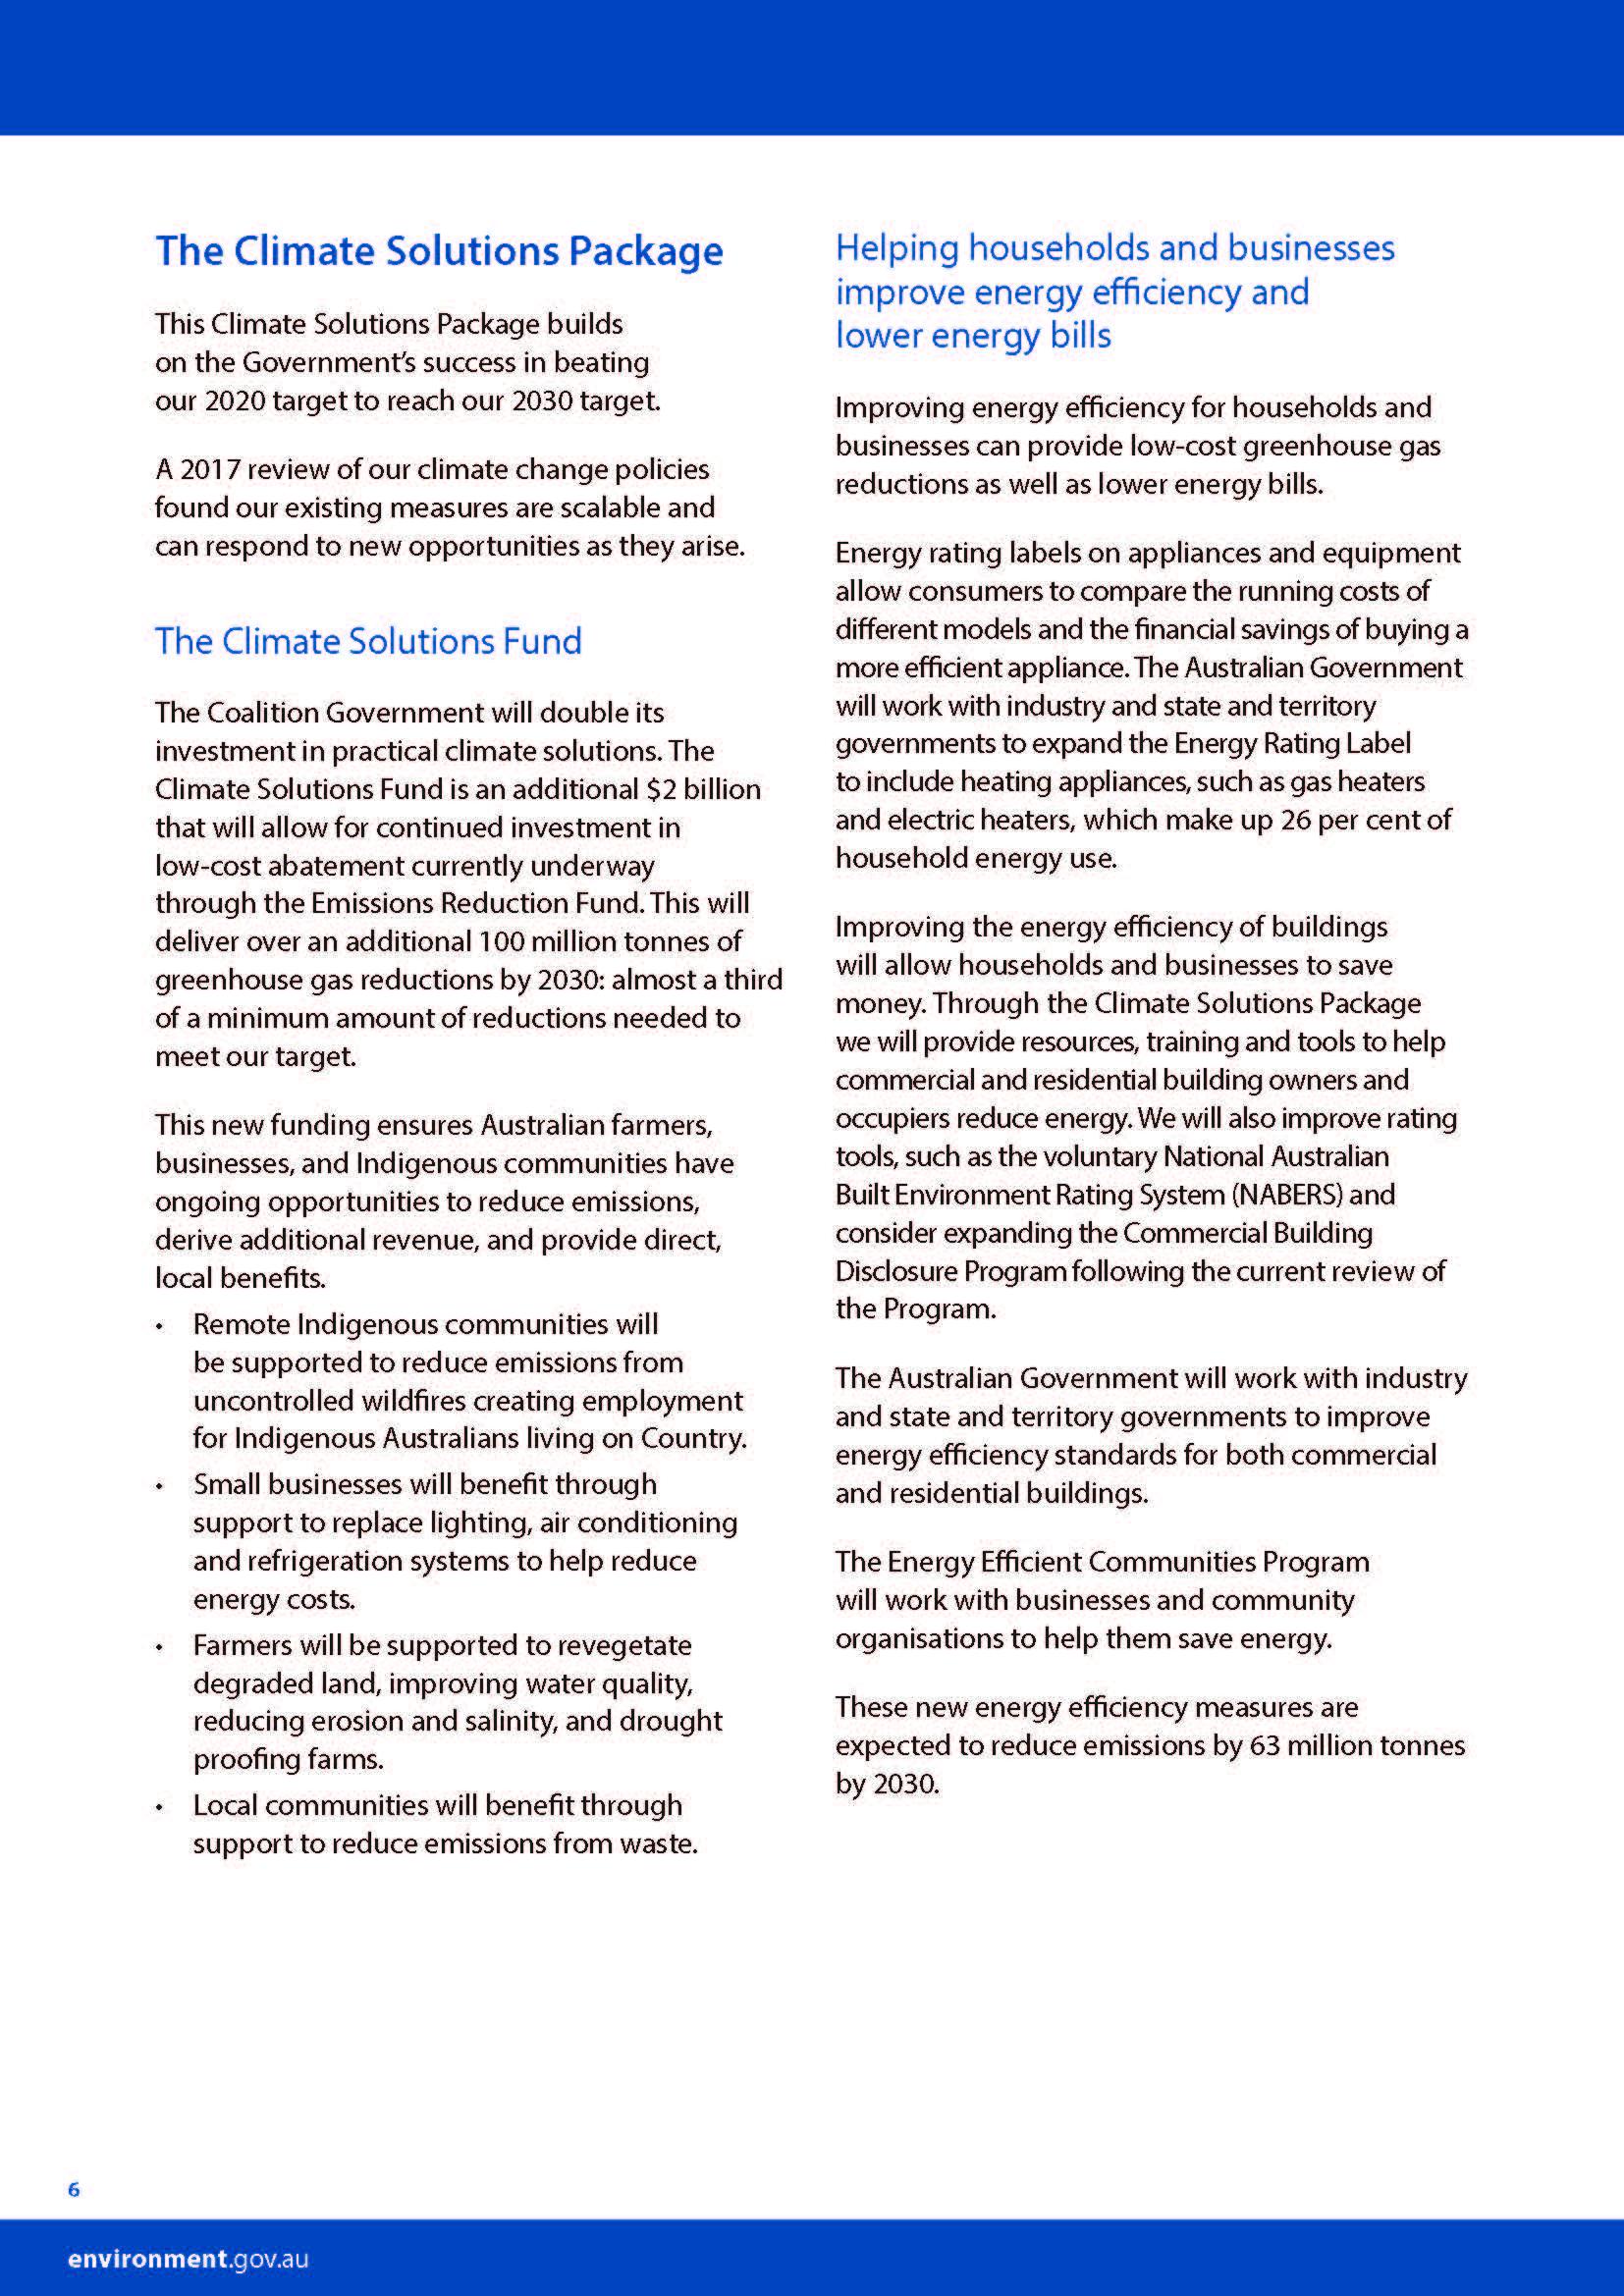 CSP Brochure_Page_6.jpg